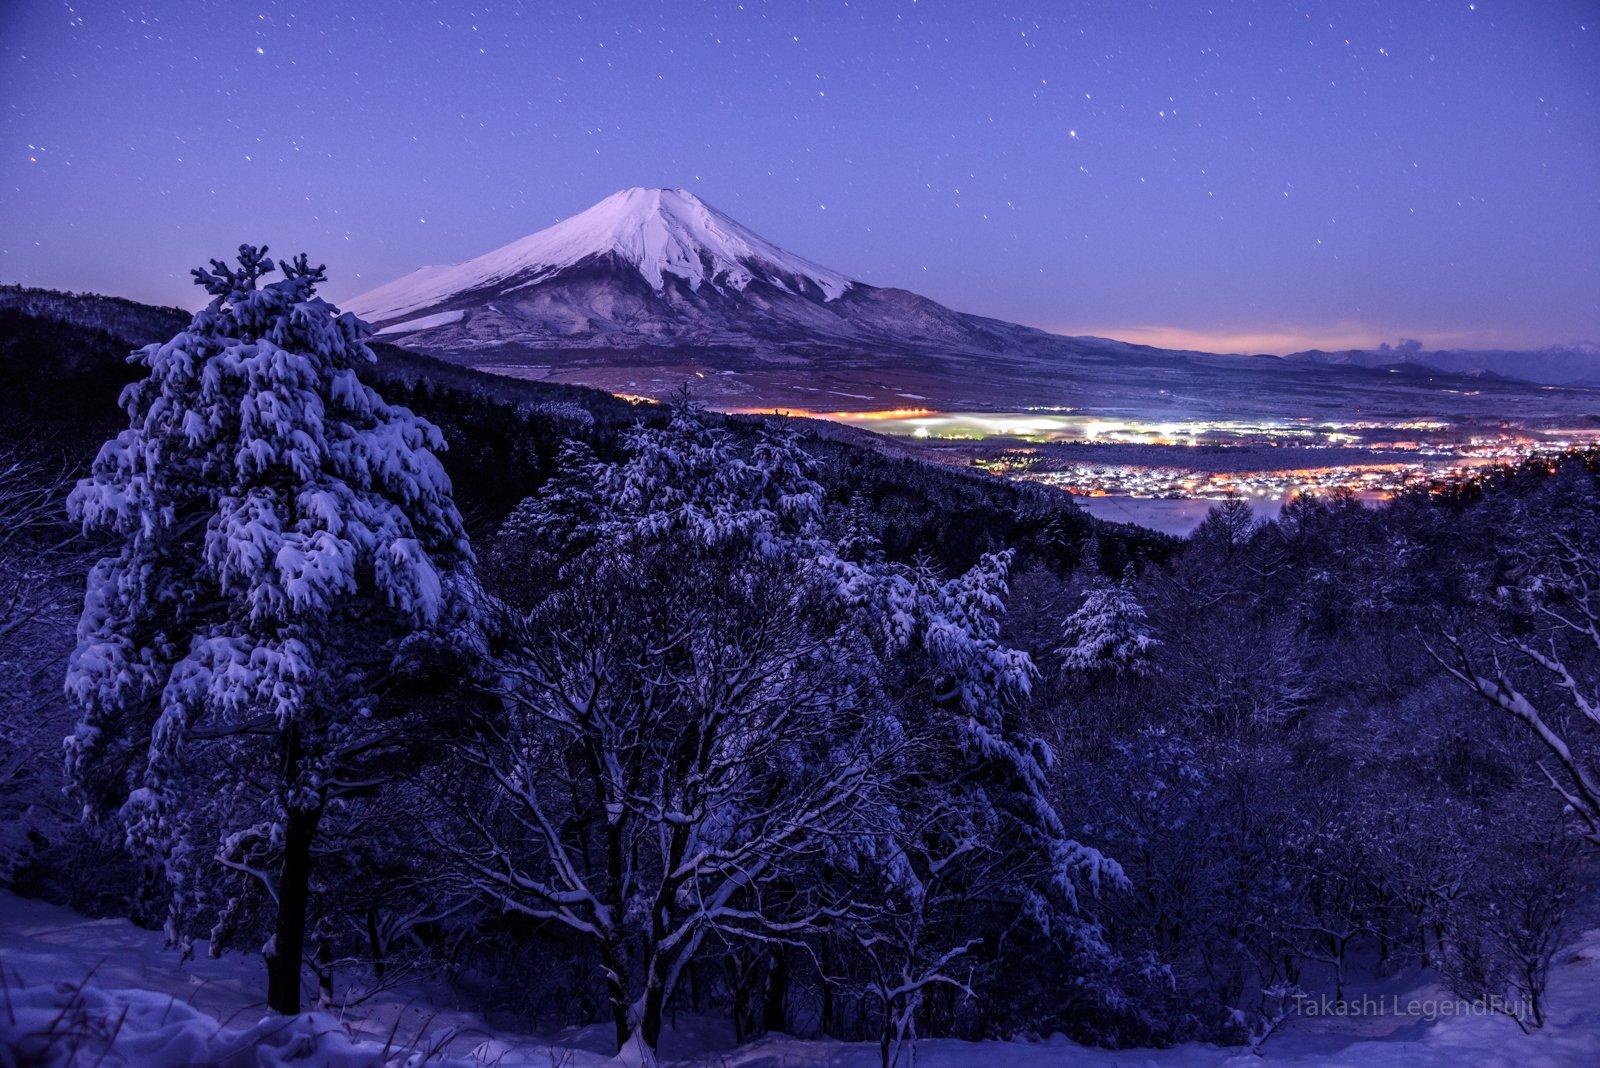 Fuji,mountain,Japan,night,snow,winter,beautiful,amazing,star,blue,moonlight,cloud, Takashi